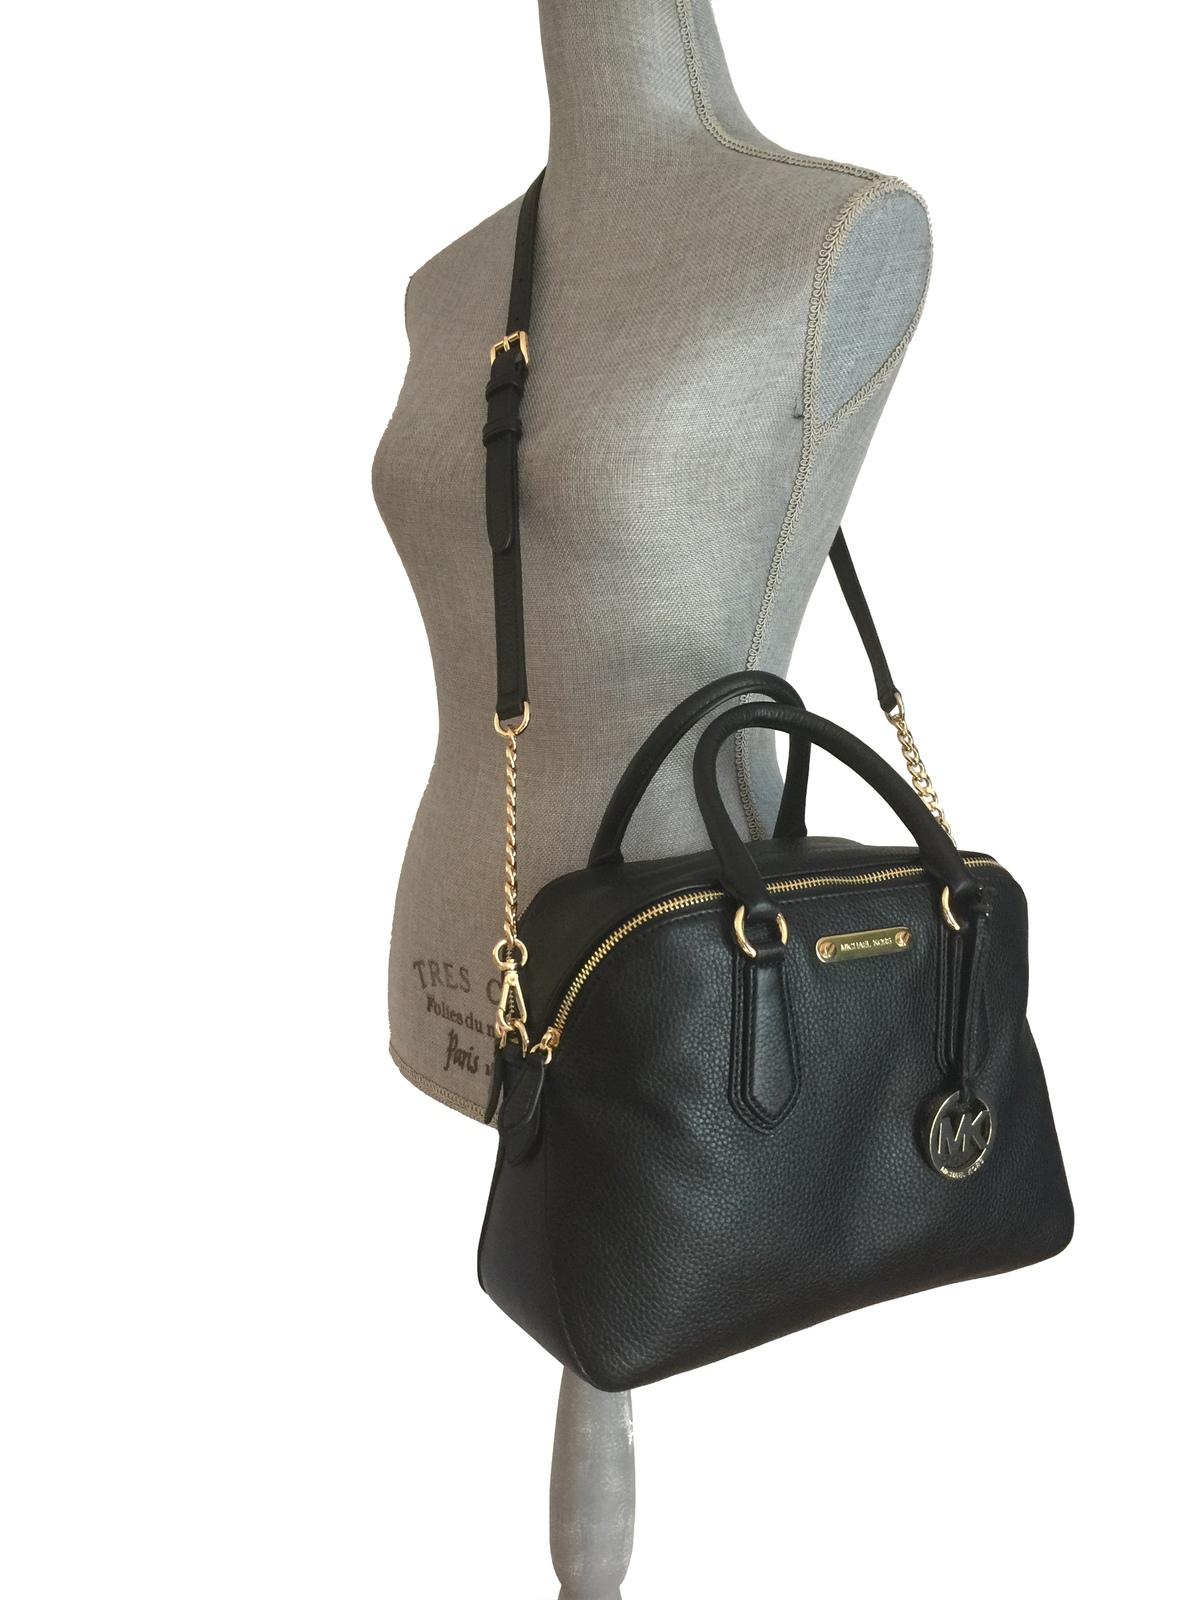 70876fa6fa8f Michael Kors Gillian Large Dual Zip Satchel Black Leather Gold MK Hardware  Bag